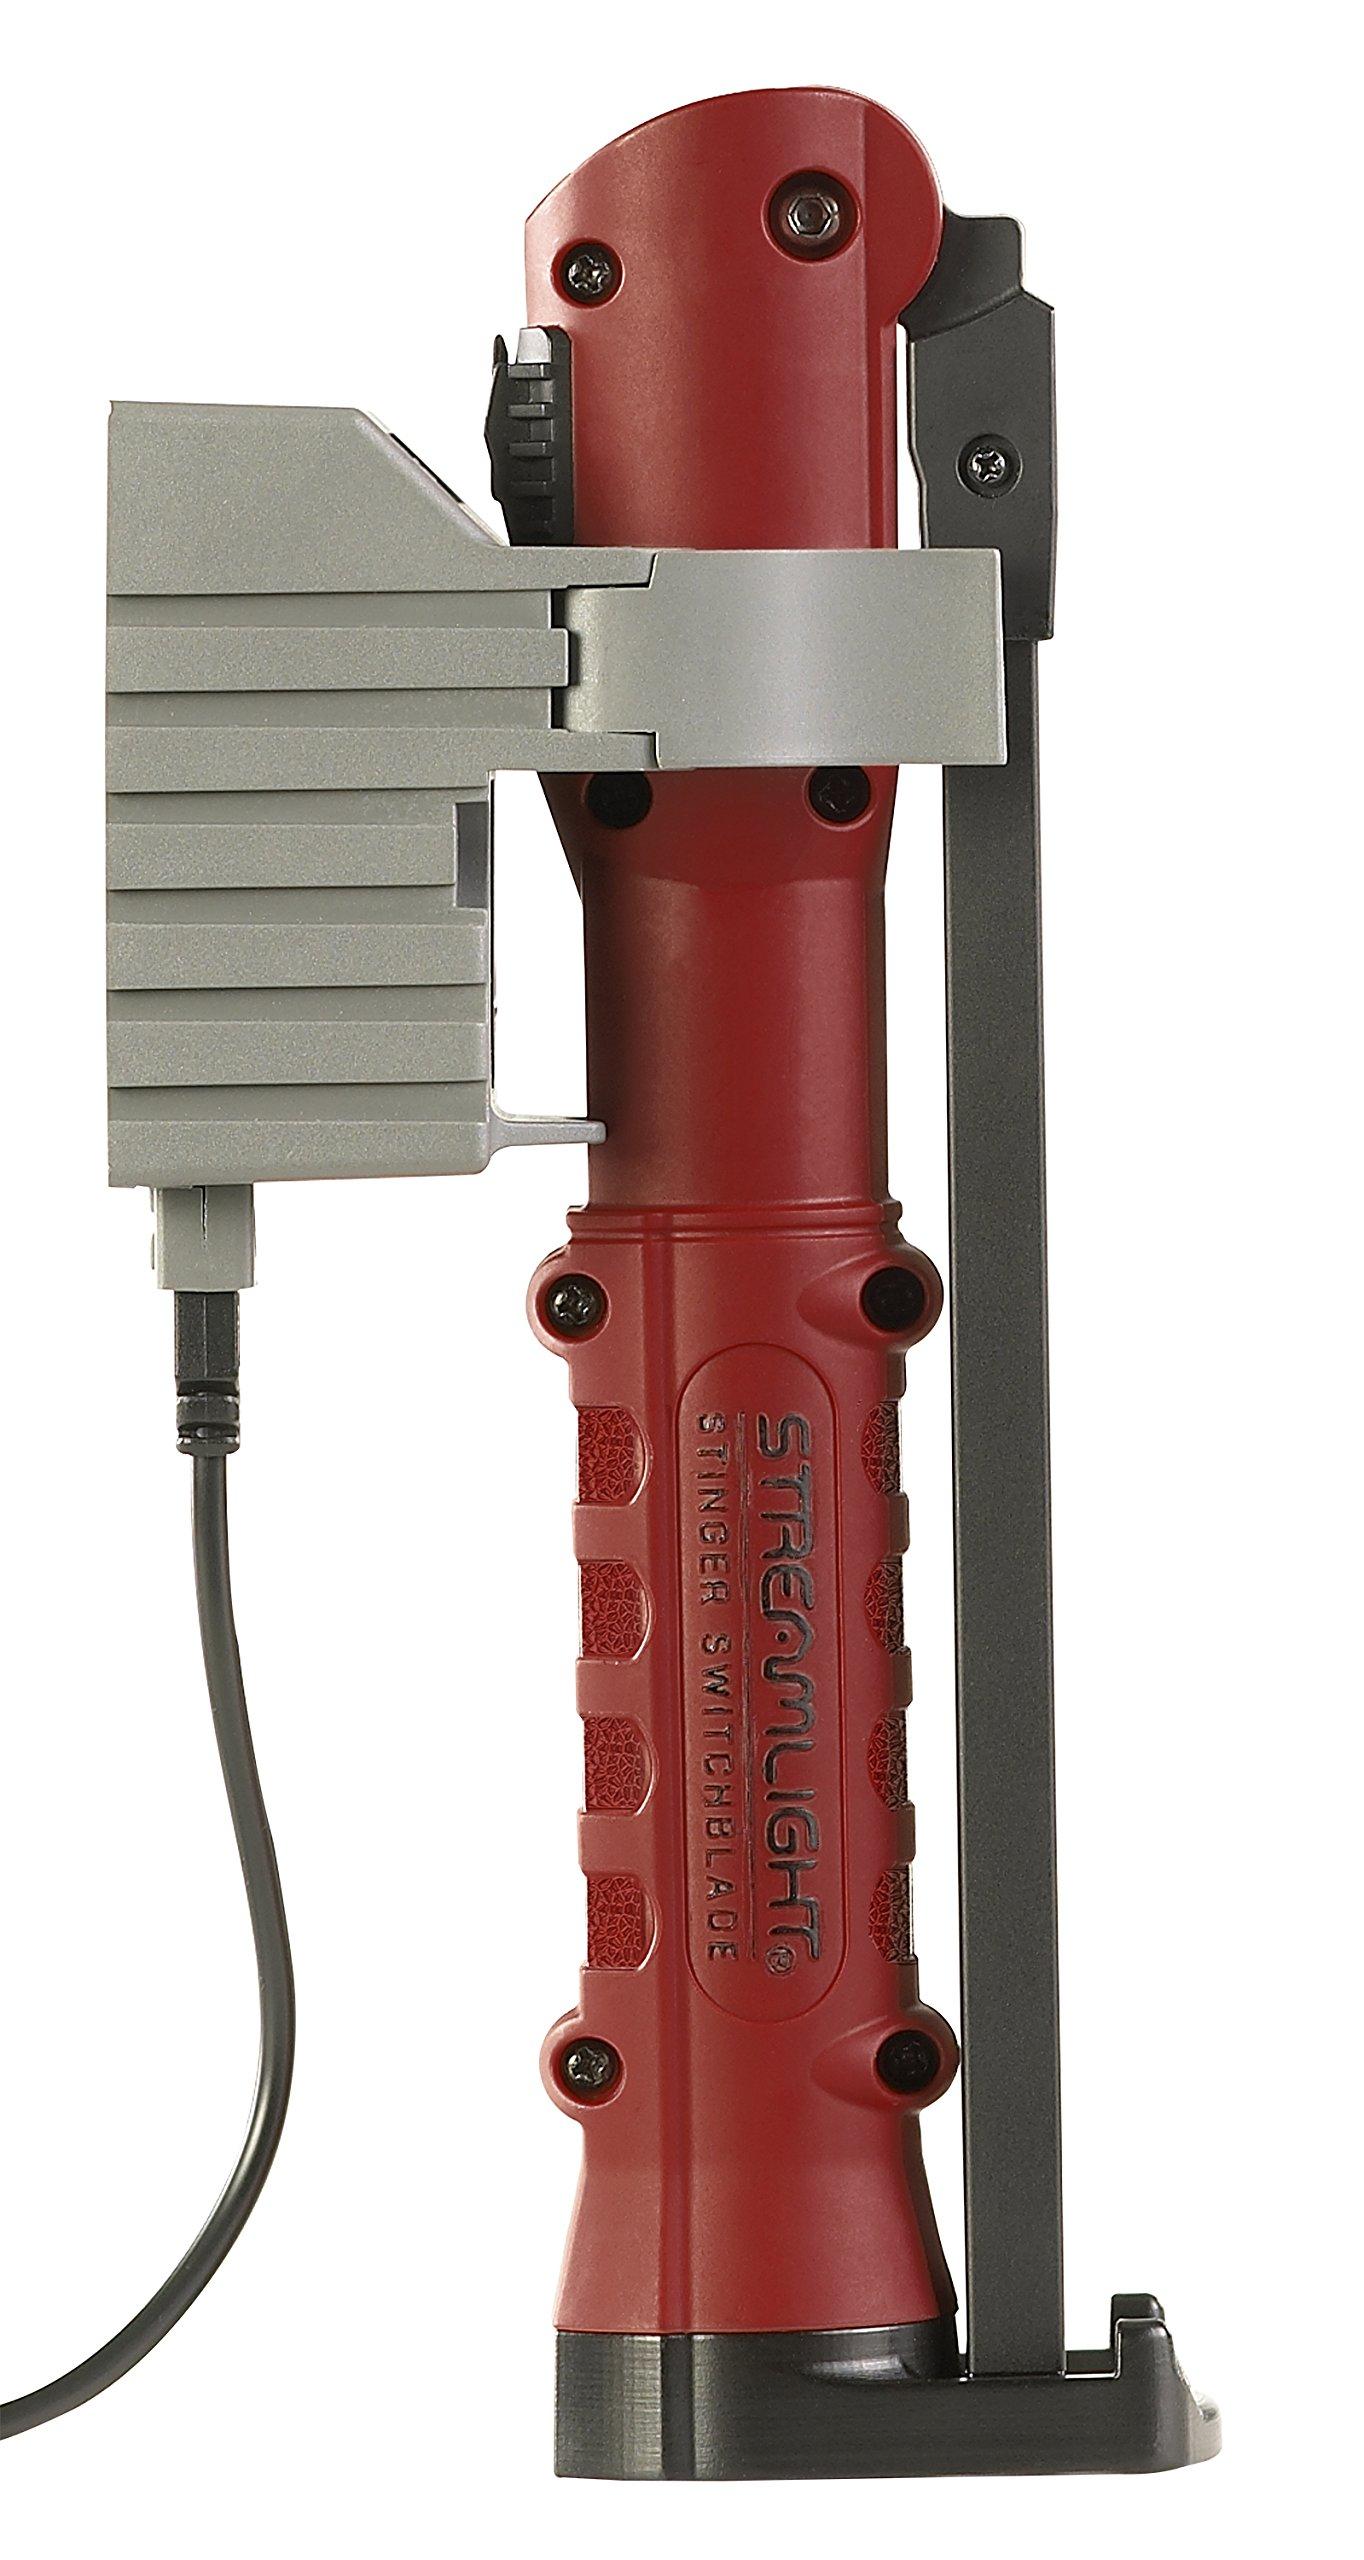 Streamlight 76800 Stinger Switchblade USB Cord Red Flashlight